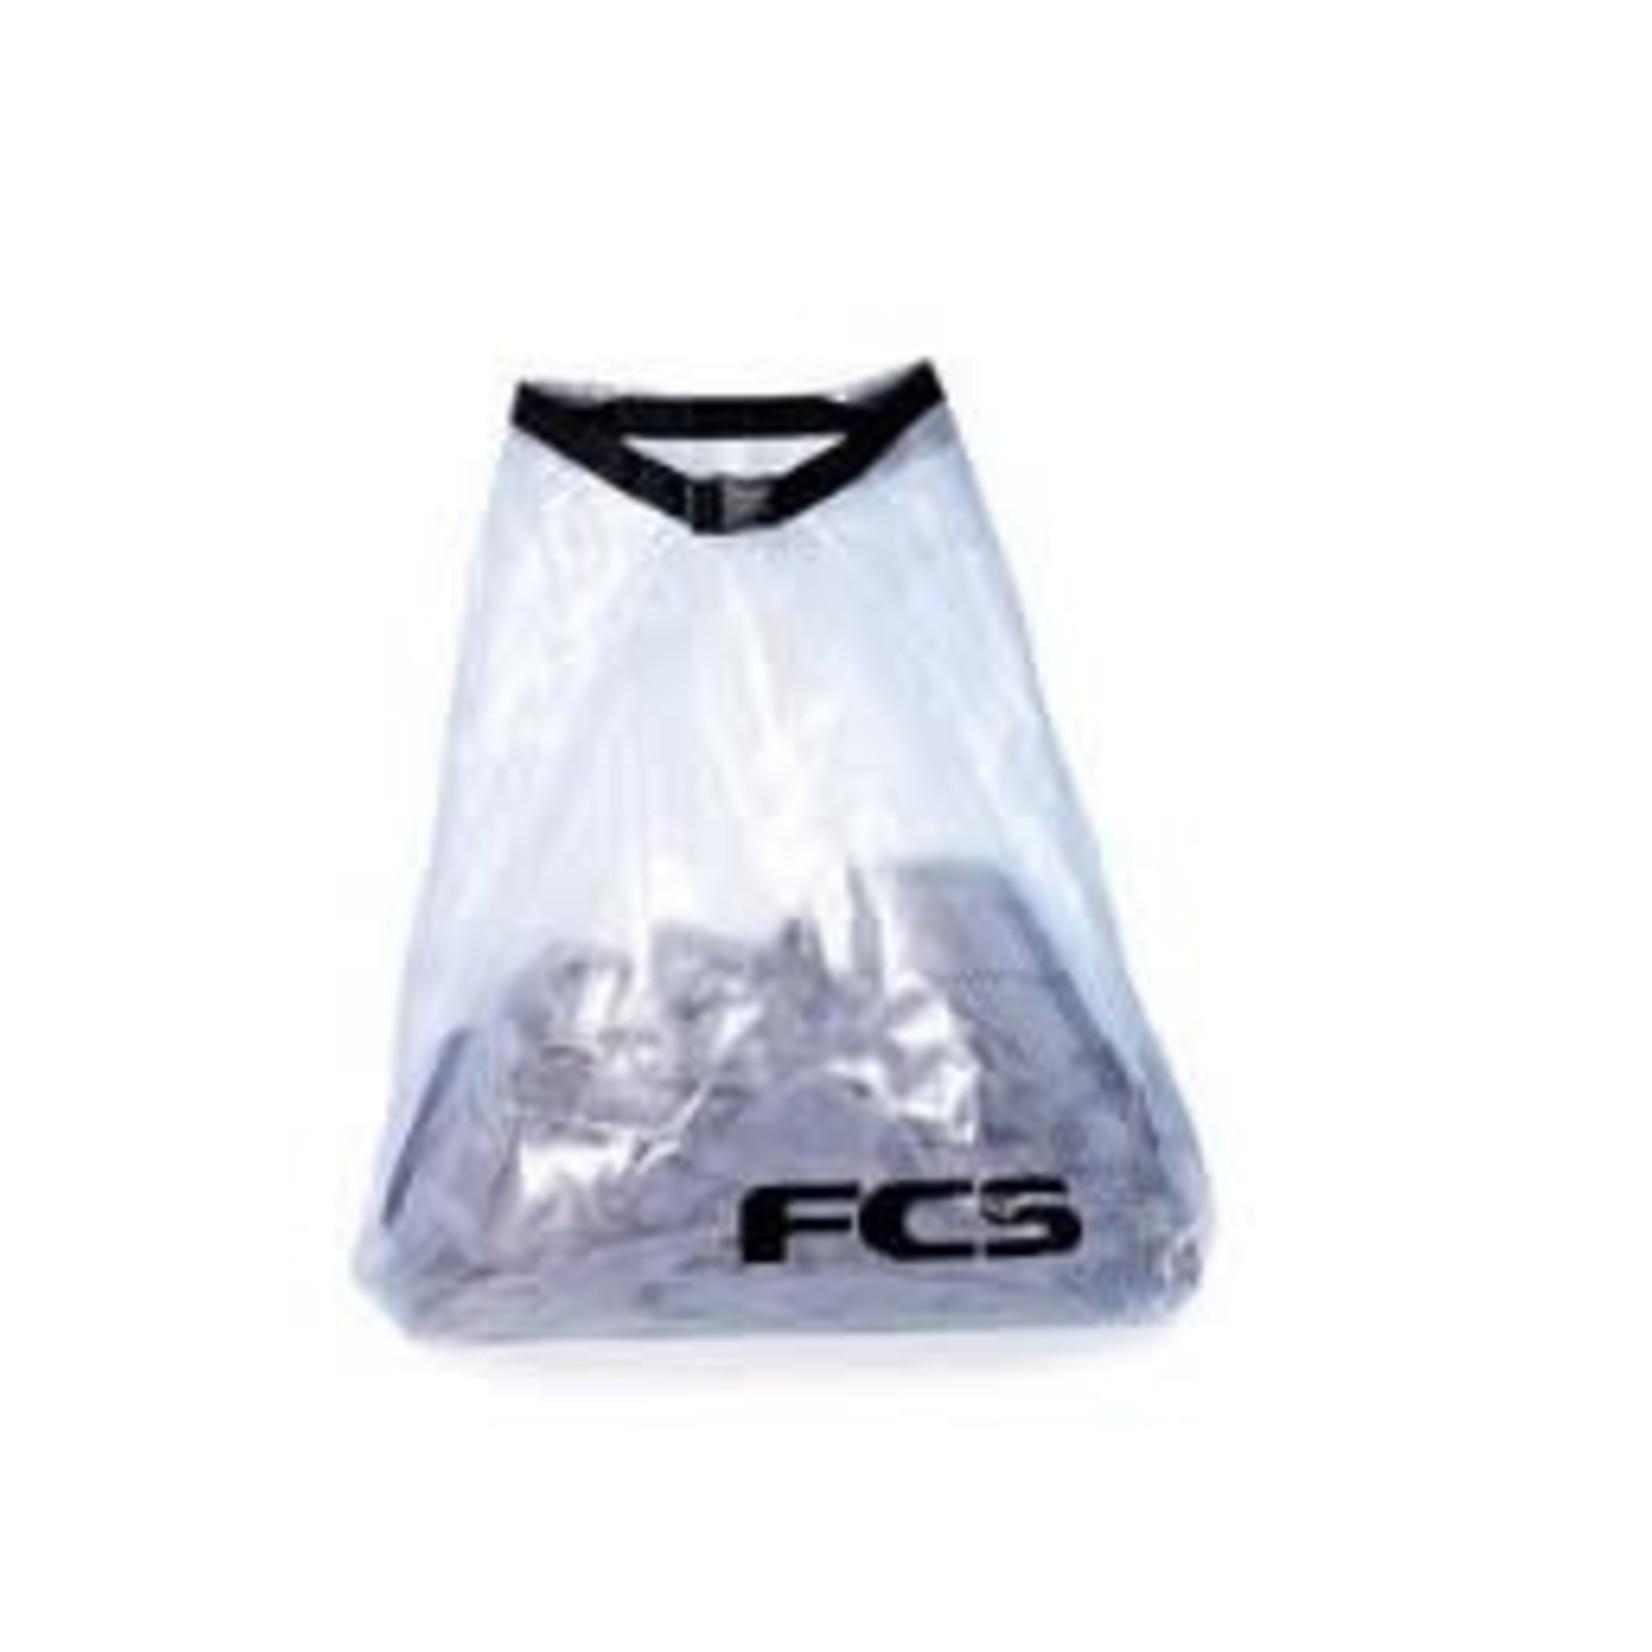 FCS FCS Large Wet/Dry Bag